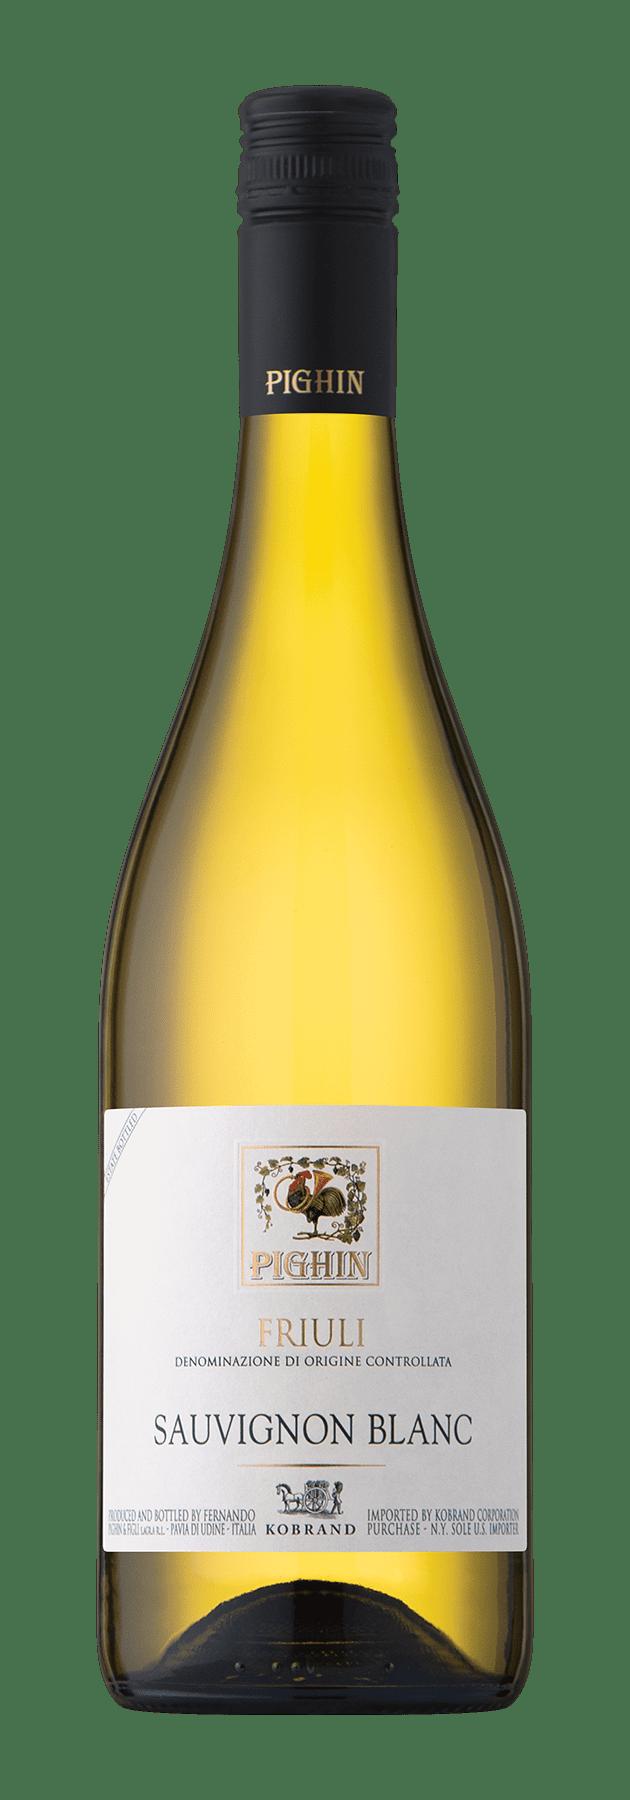 Pighin Sauvignon Blanc